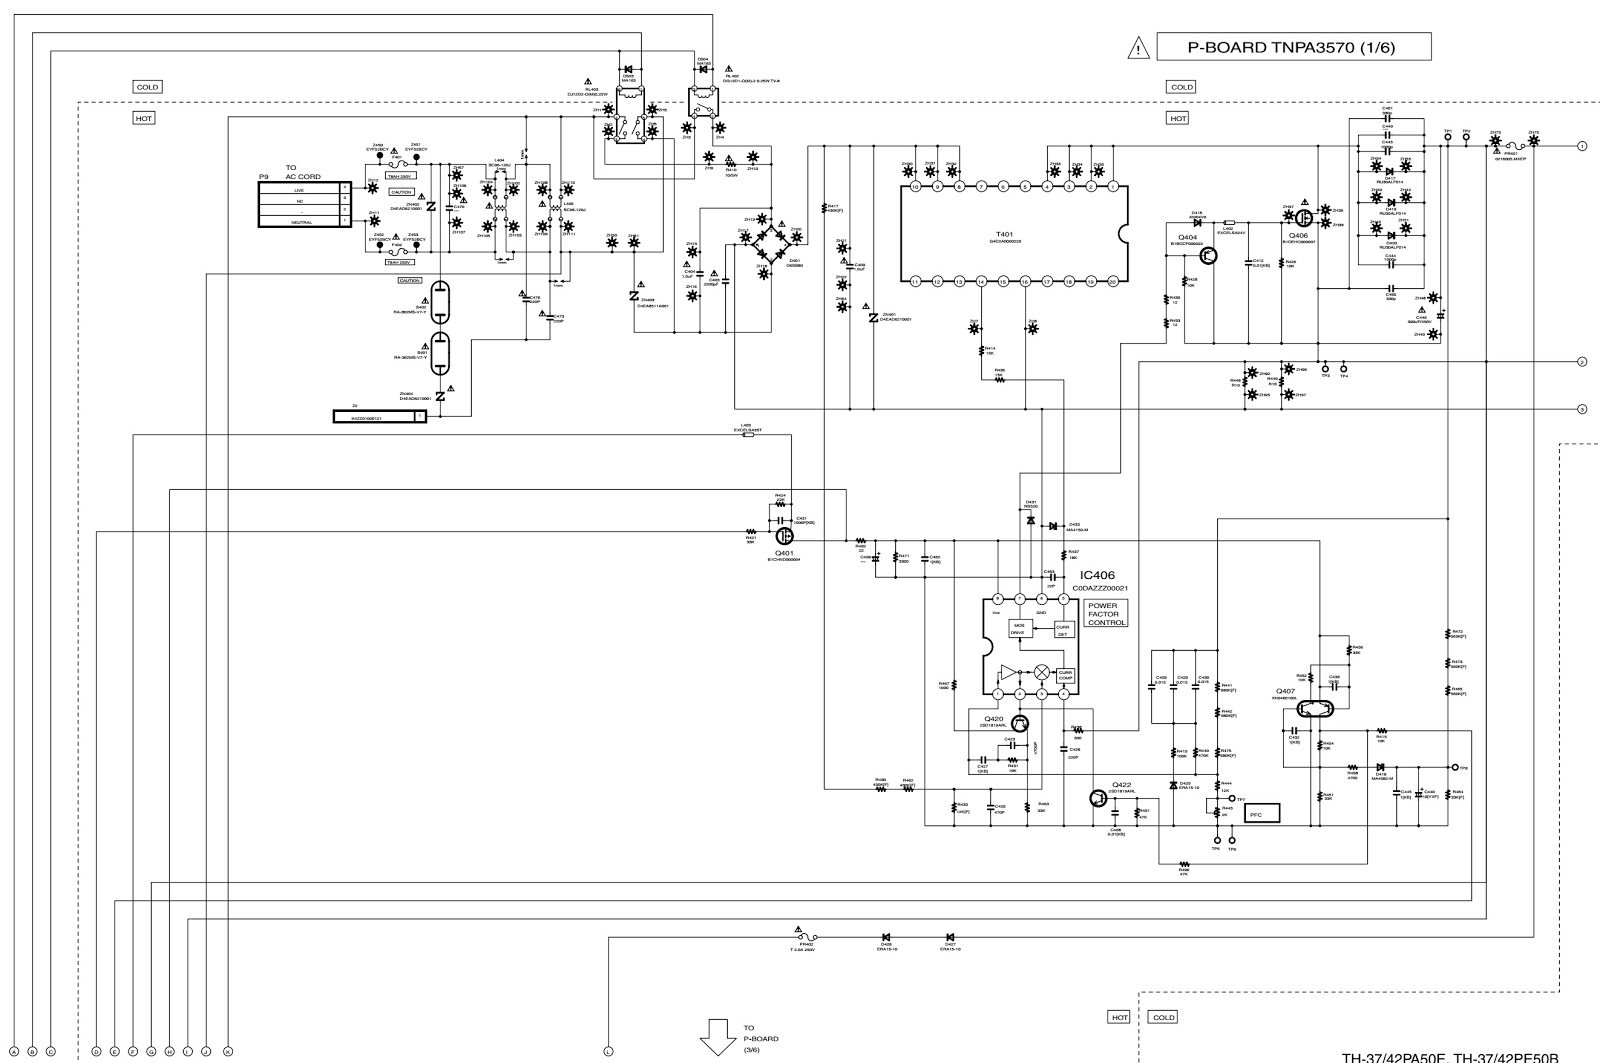 medium resolution of panasonic plasma tv th42 th37 power board schematic panasonic tv parts direct panasonic tv parts direct